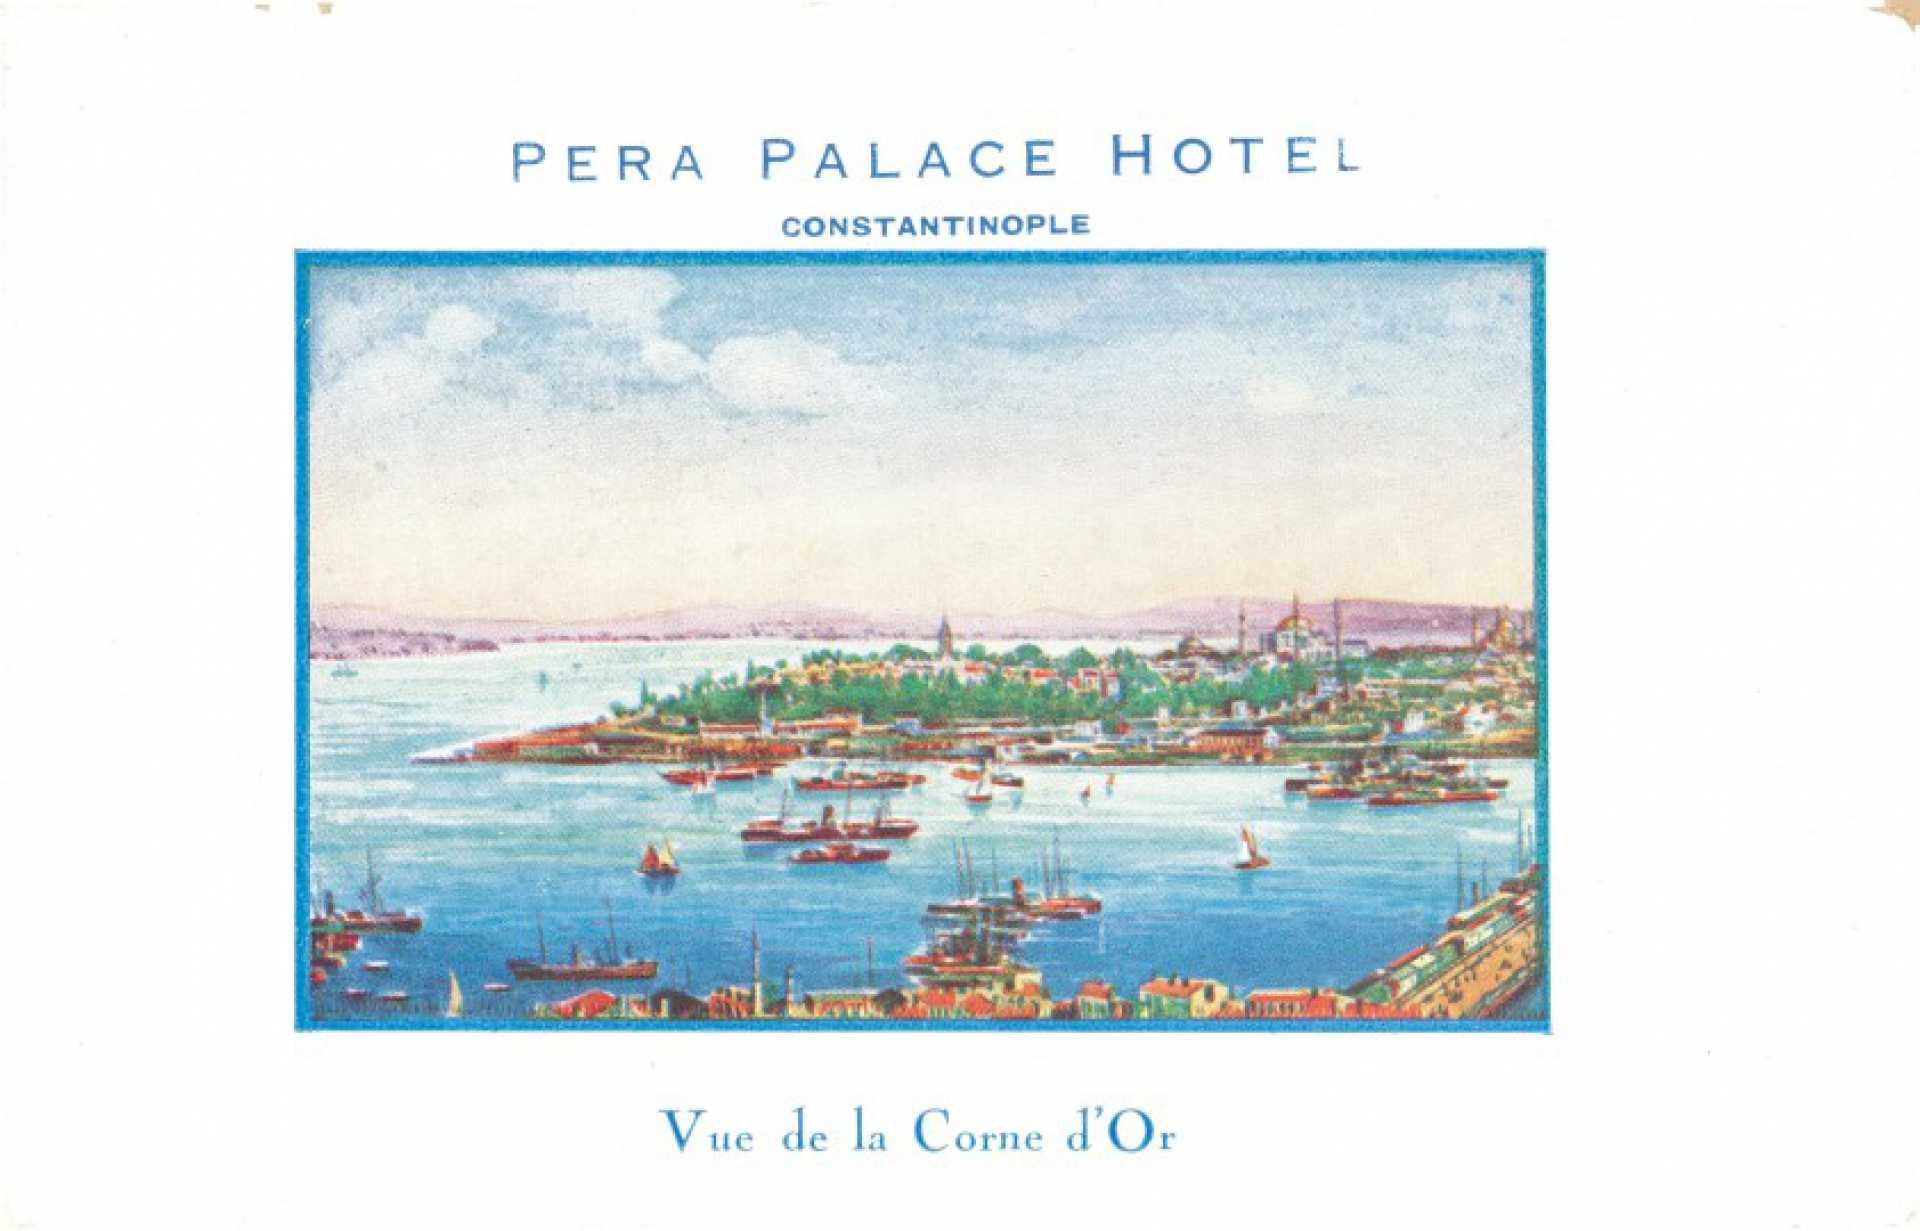 Pera Palace Hotel. Vue de la Corne d'Or